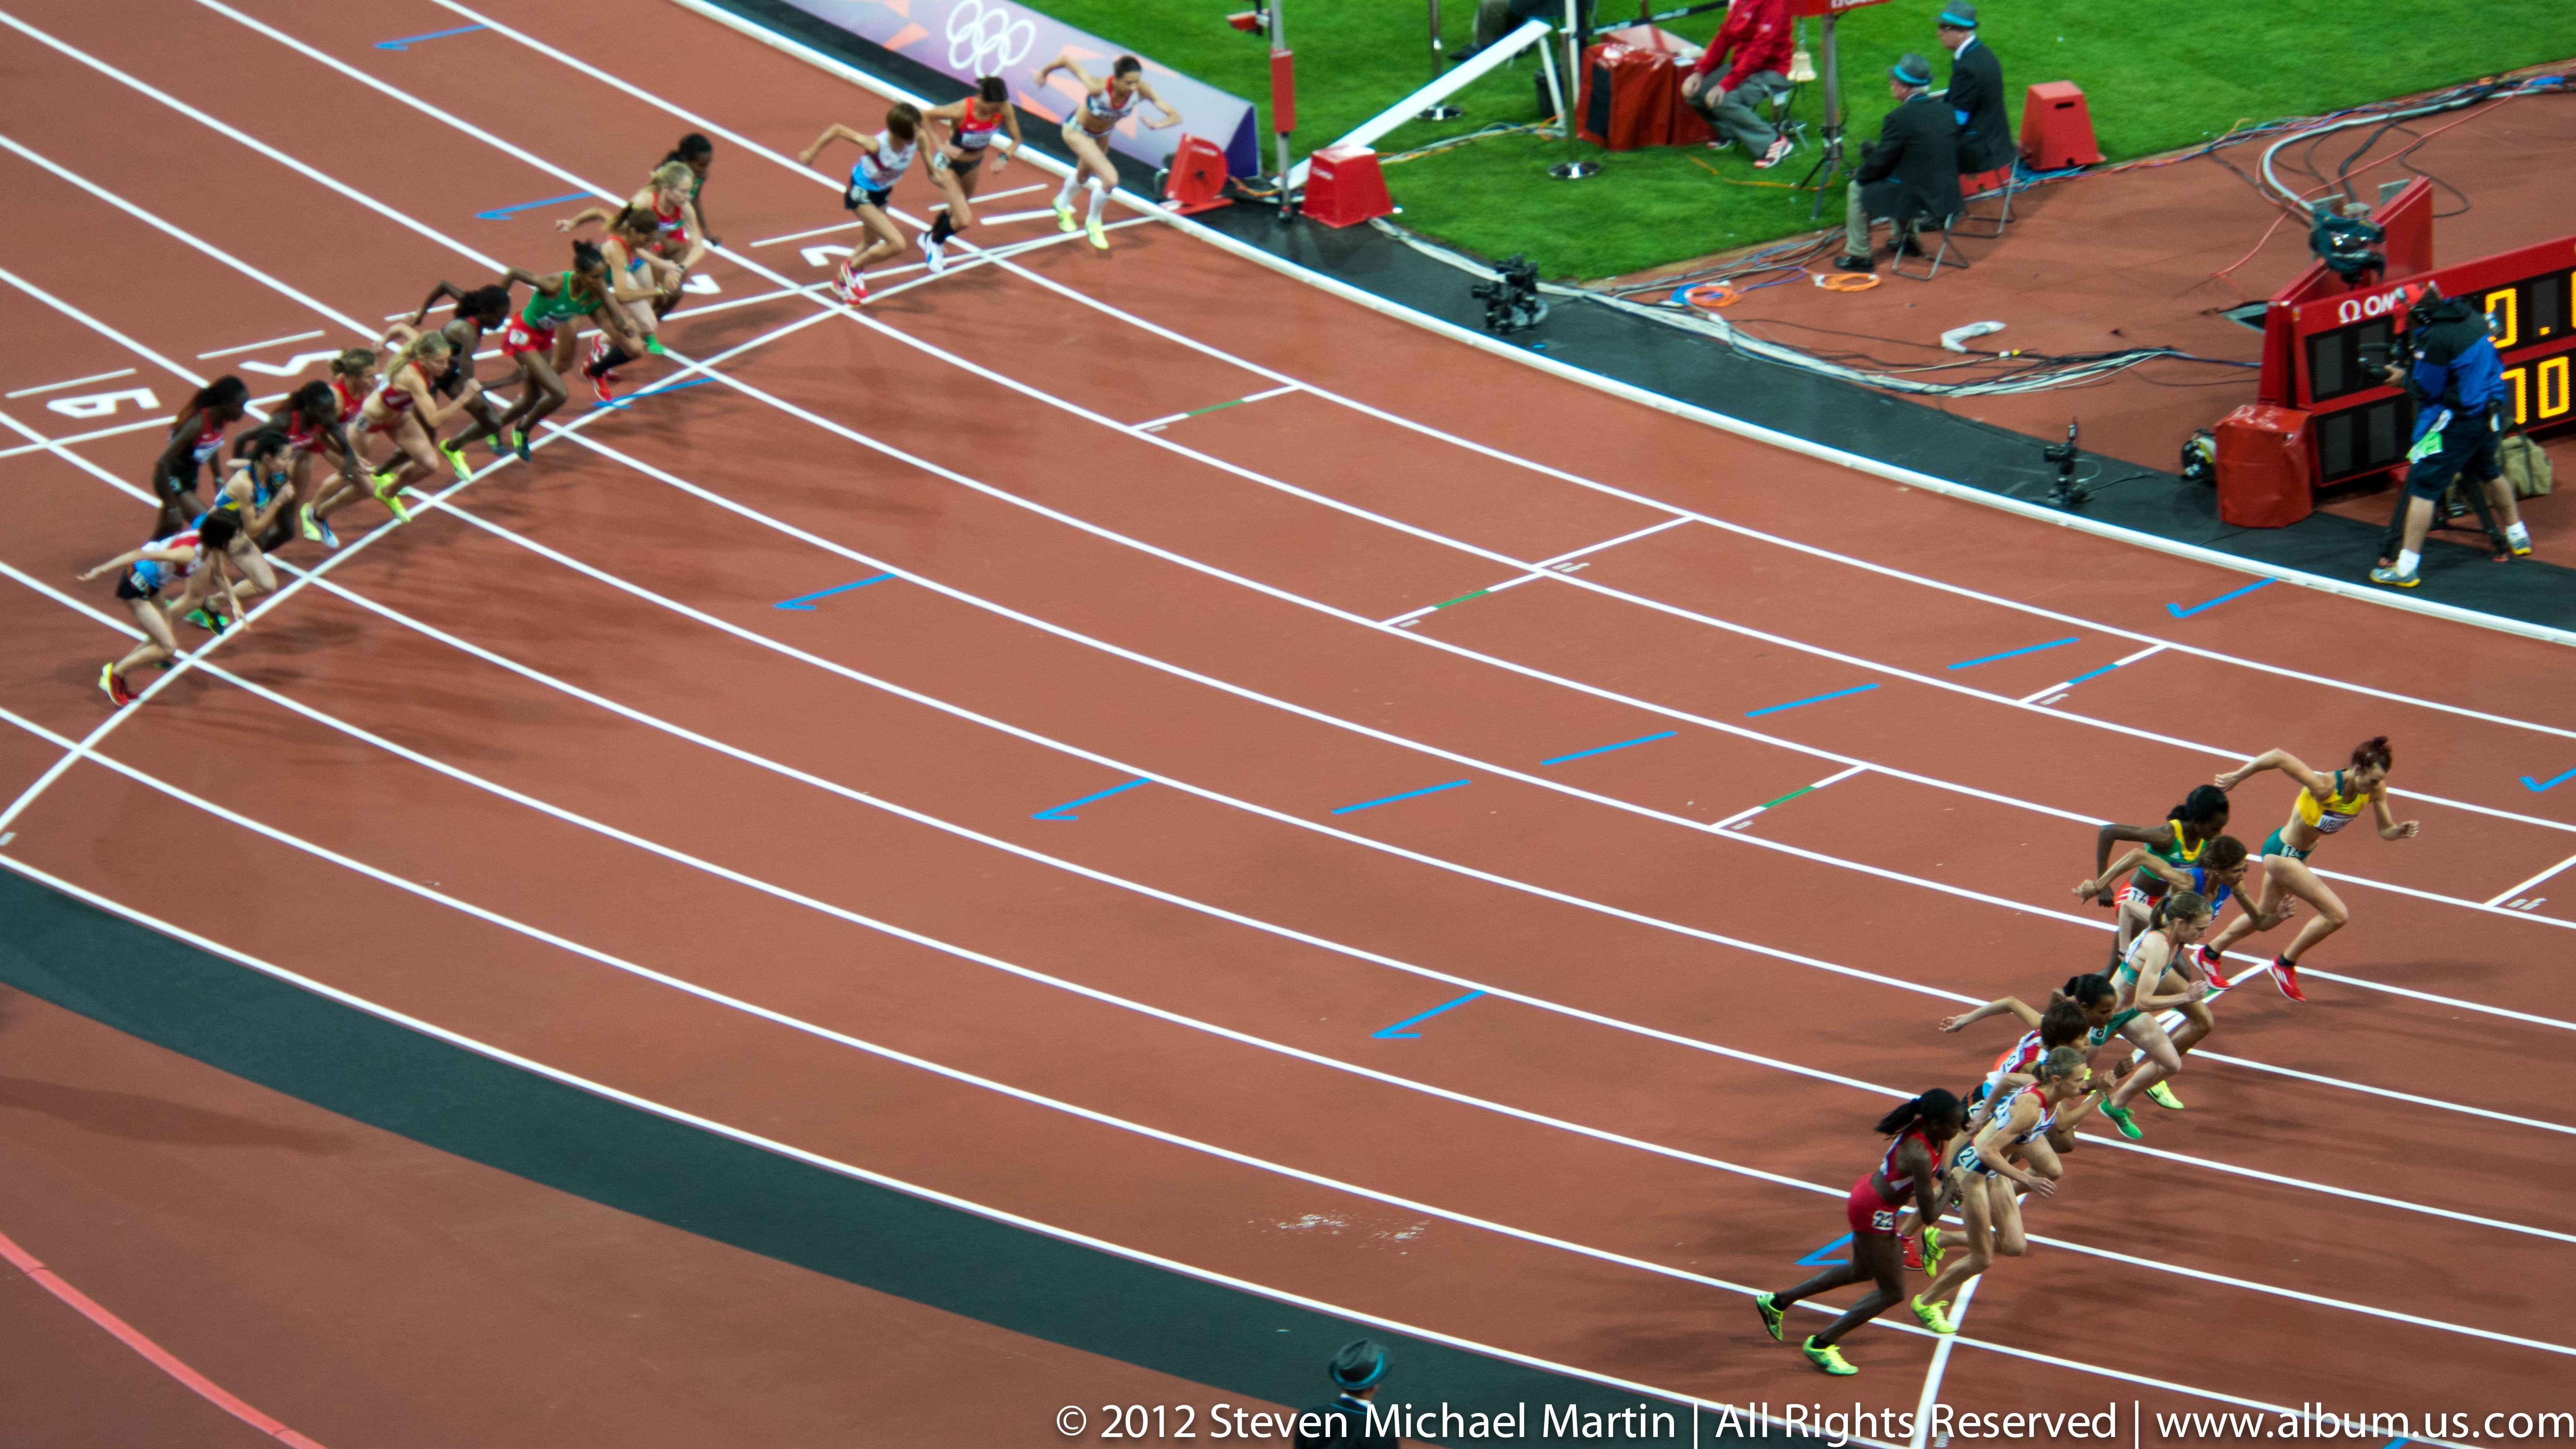 SMartin_2012 Olympics Athletics_20120803_035